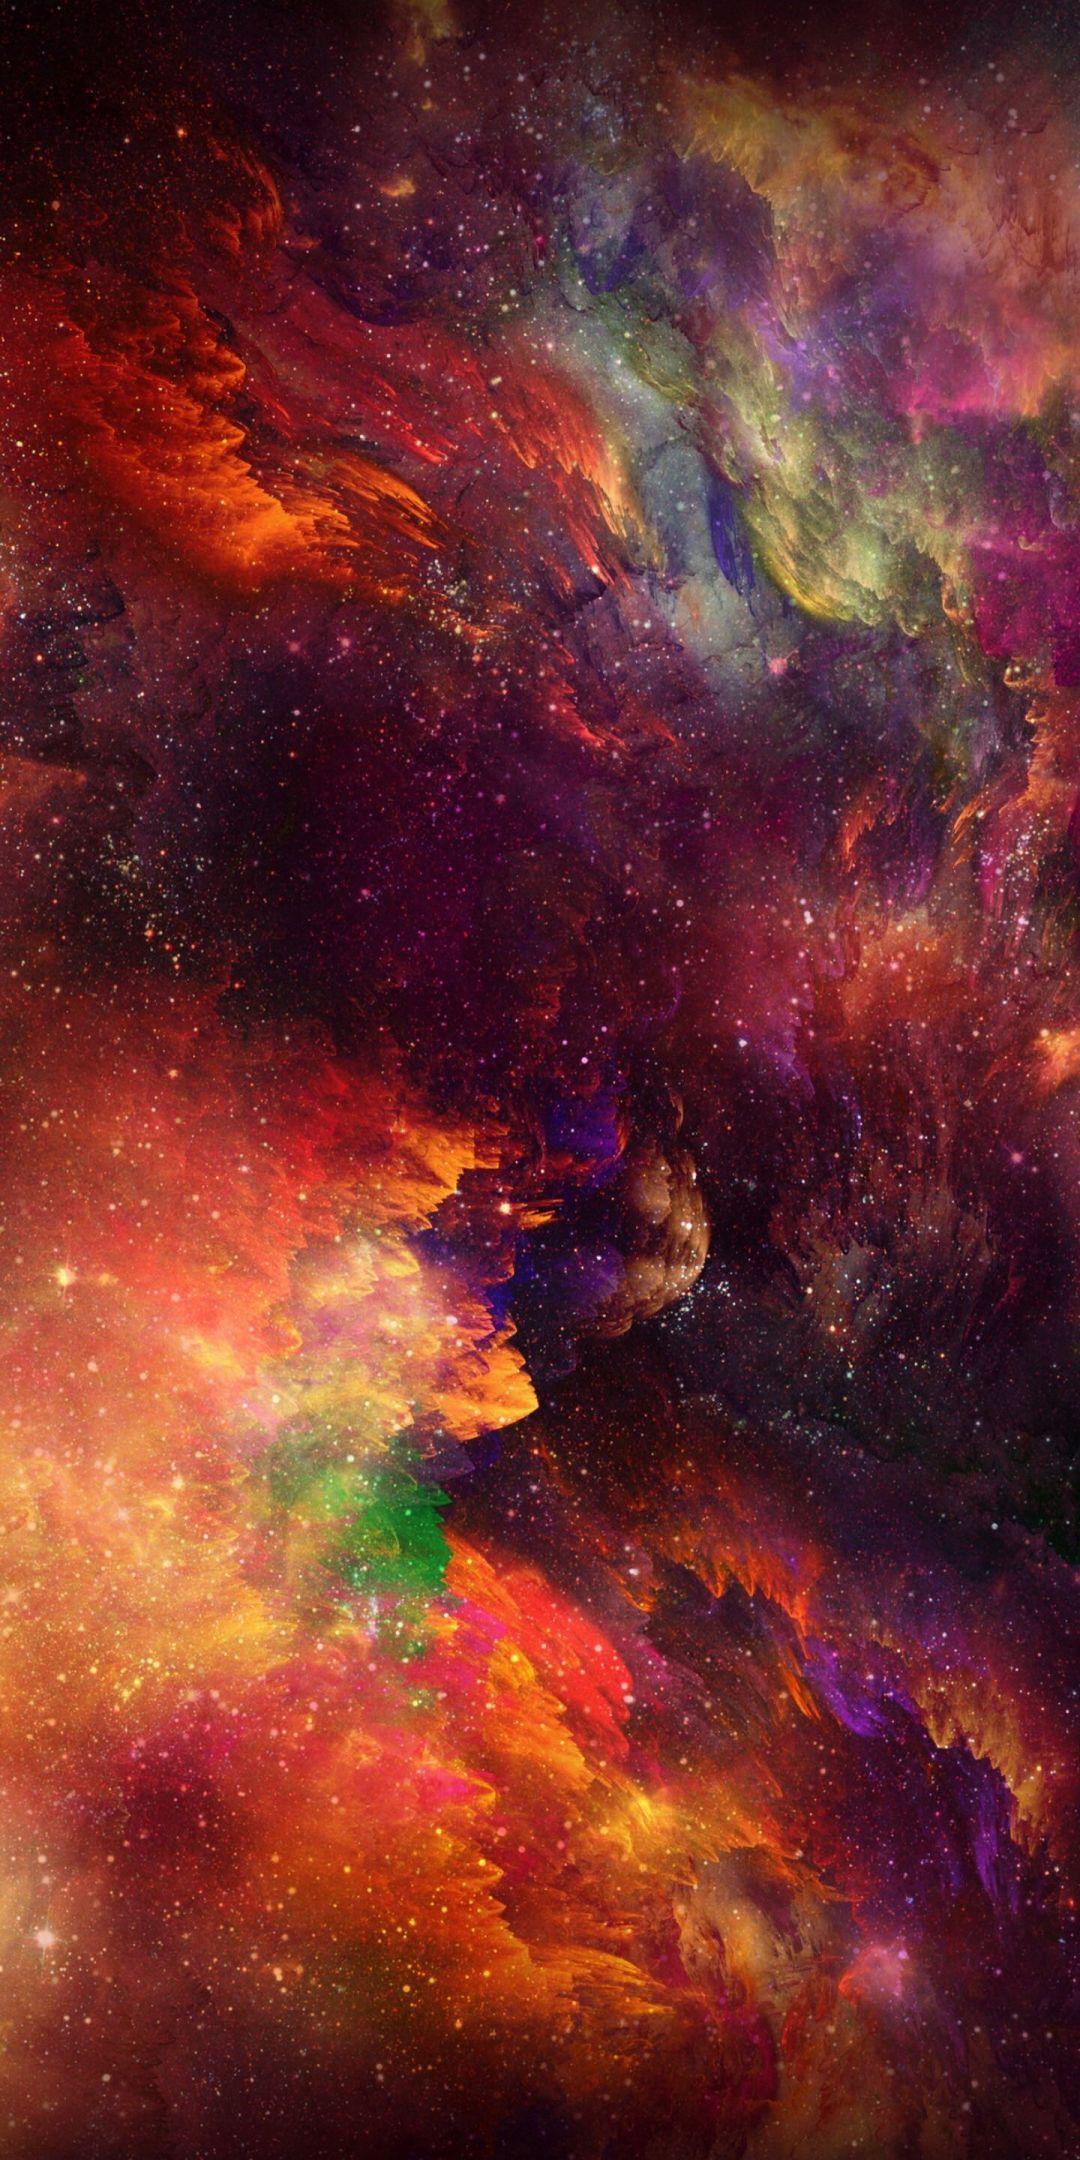 iPhone X HD 1080p 4k Wallpapers - Wallpaper Cave